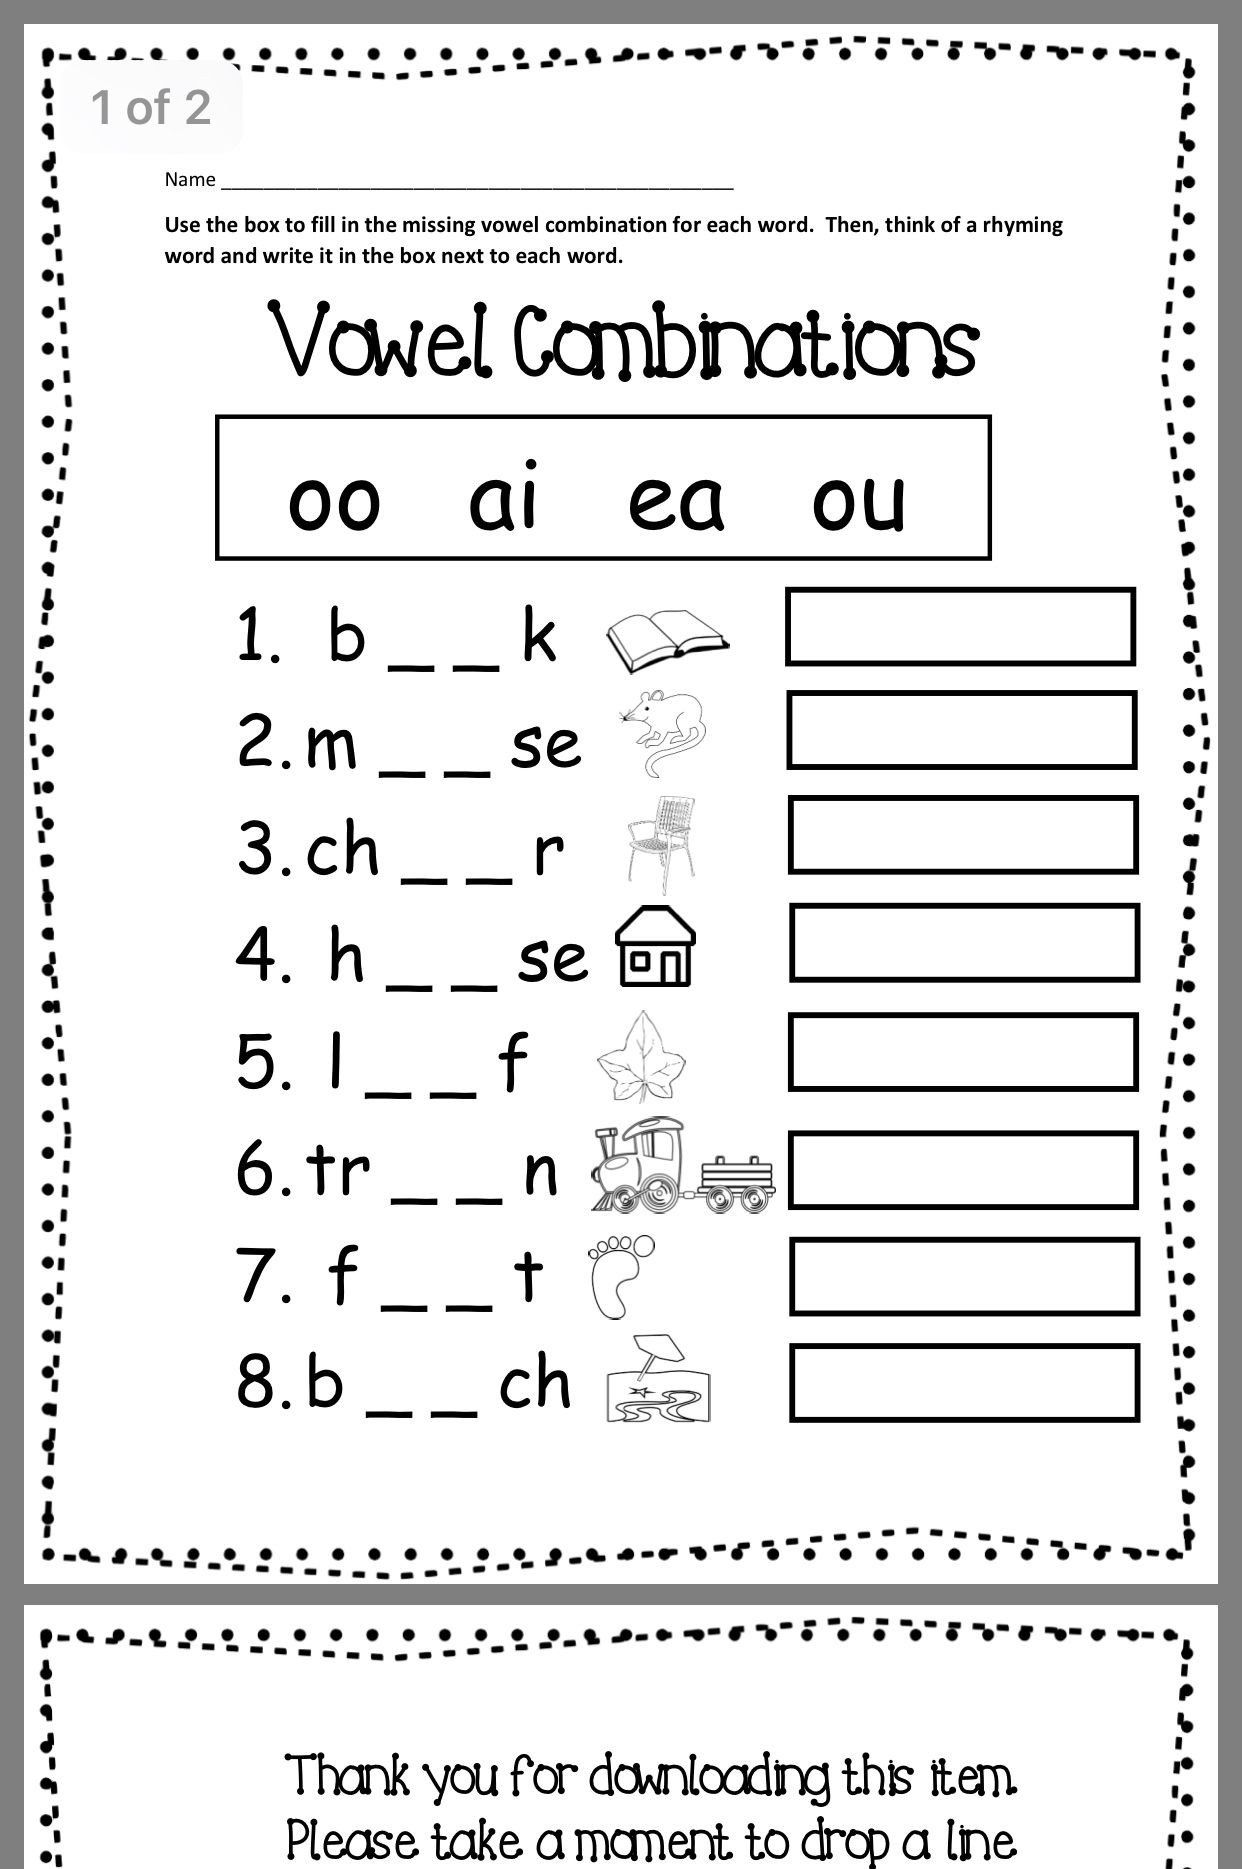 Phonics Worksheets 2nd Grade Pin By Byanka Owen Rodriguez On Education In 2020 Phonics Worksheets Free 2nd Grade Worksheets Phonics Worksheets